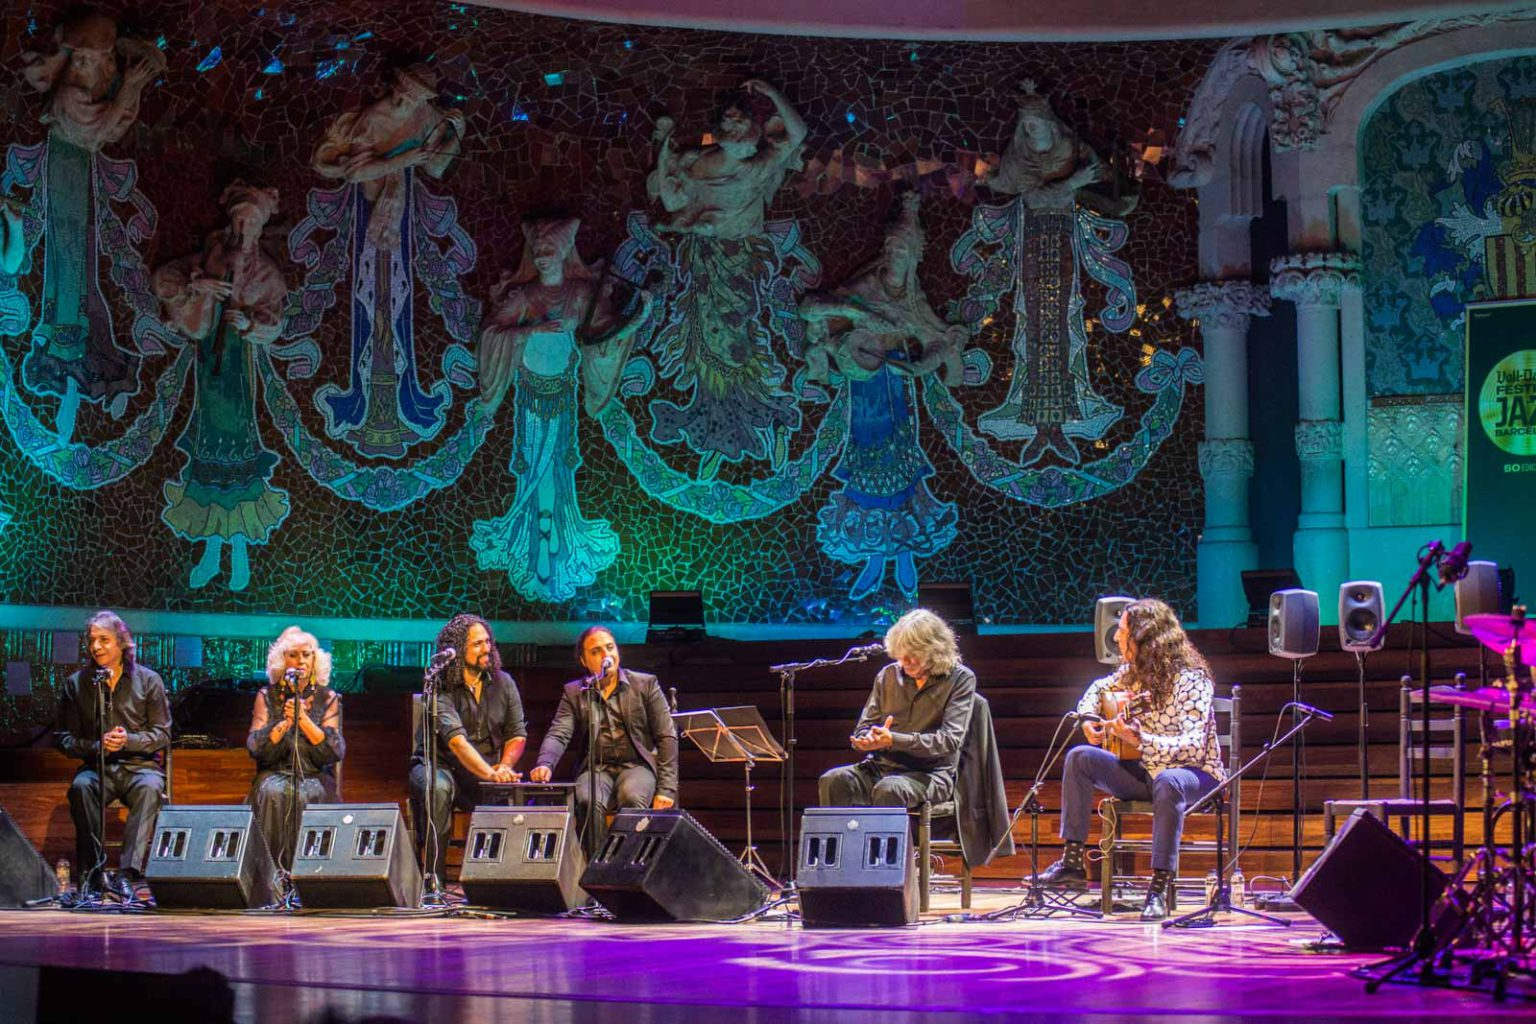 Tomatito - Jose Merce al Palau de la Música Catalana, Festival de Jazz de Barcelona, 16/11/2018. FOTO: MARINA TOMAS ROCH.